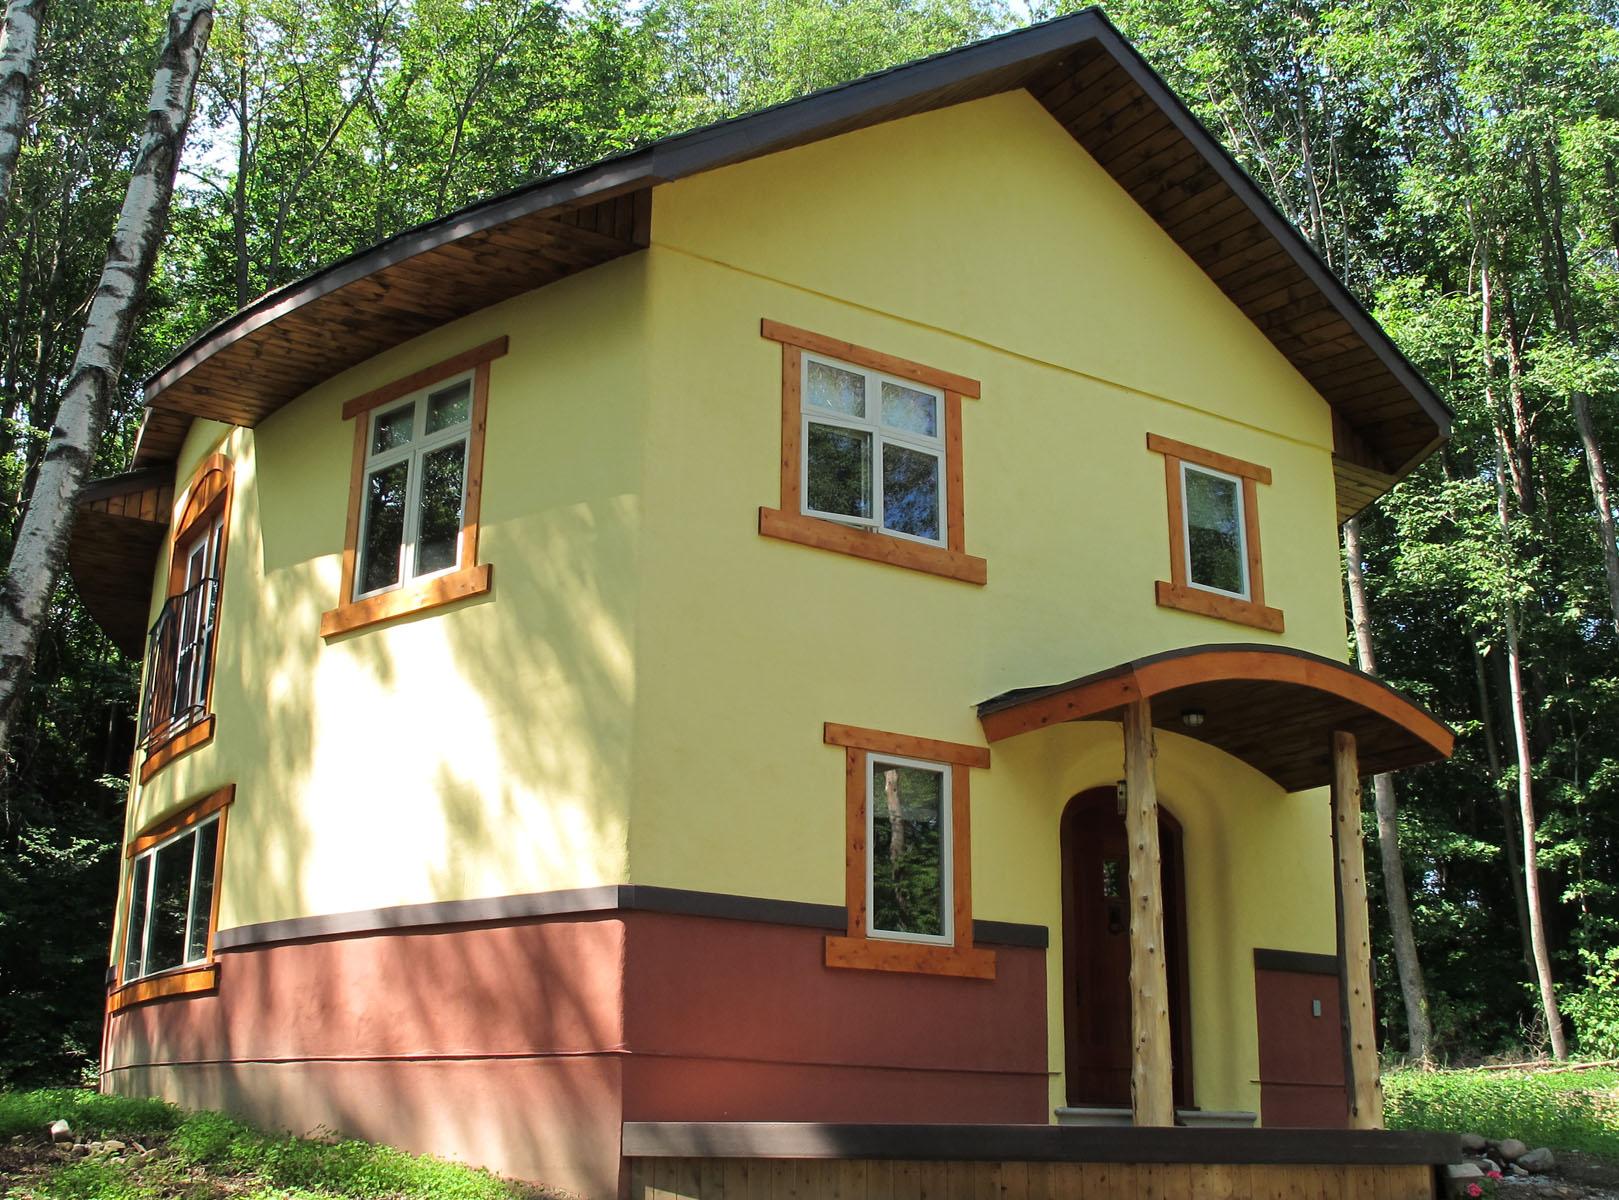 Oval Straw Bale House, Hillsburg